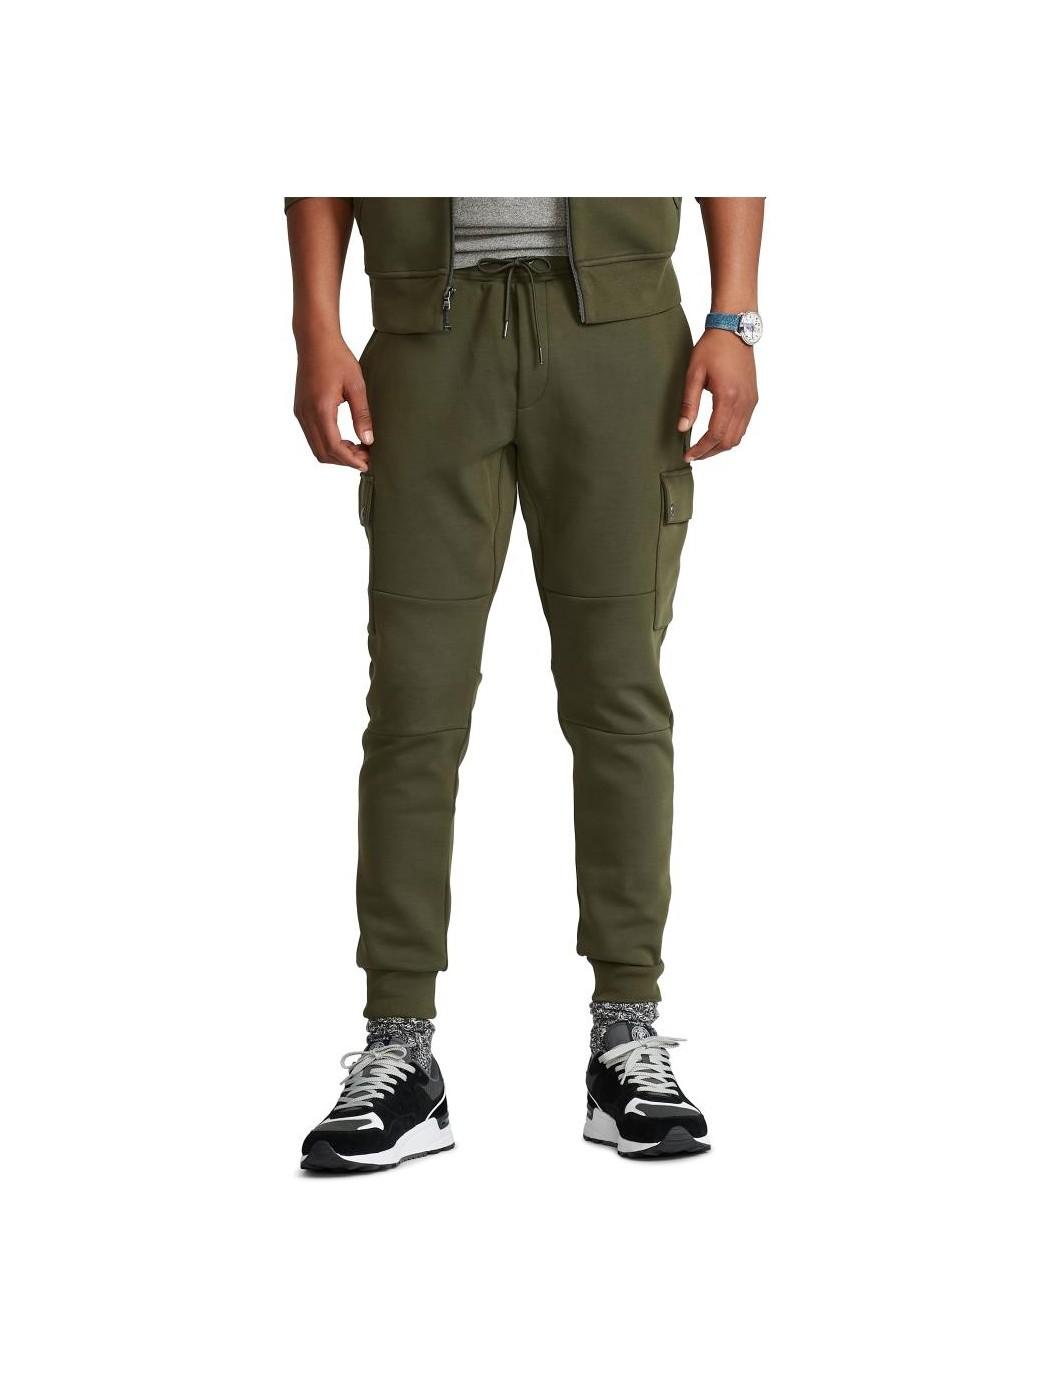 Pantaloni da jogging cargo...